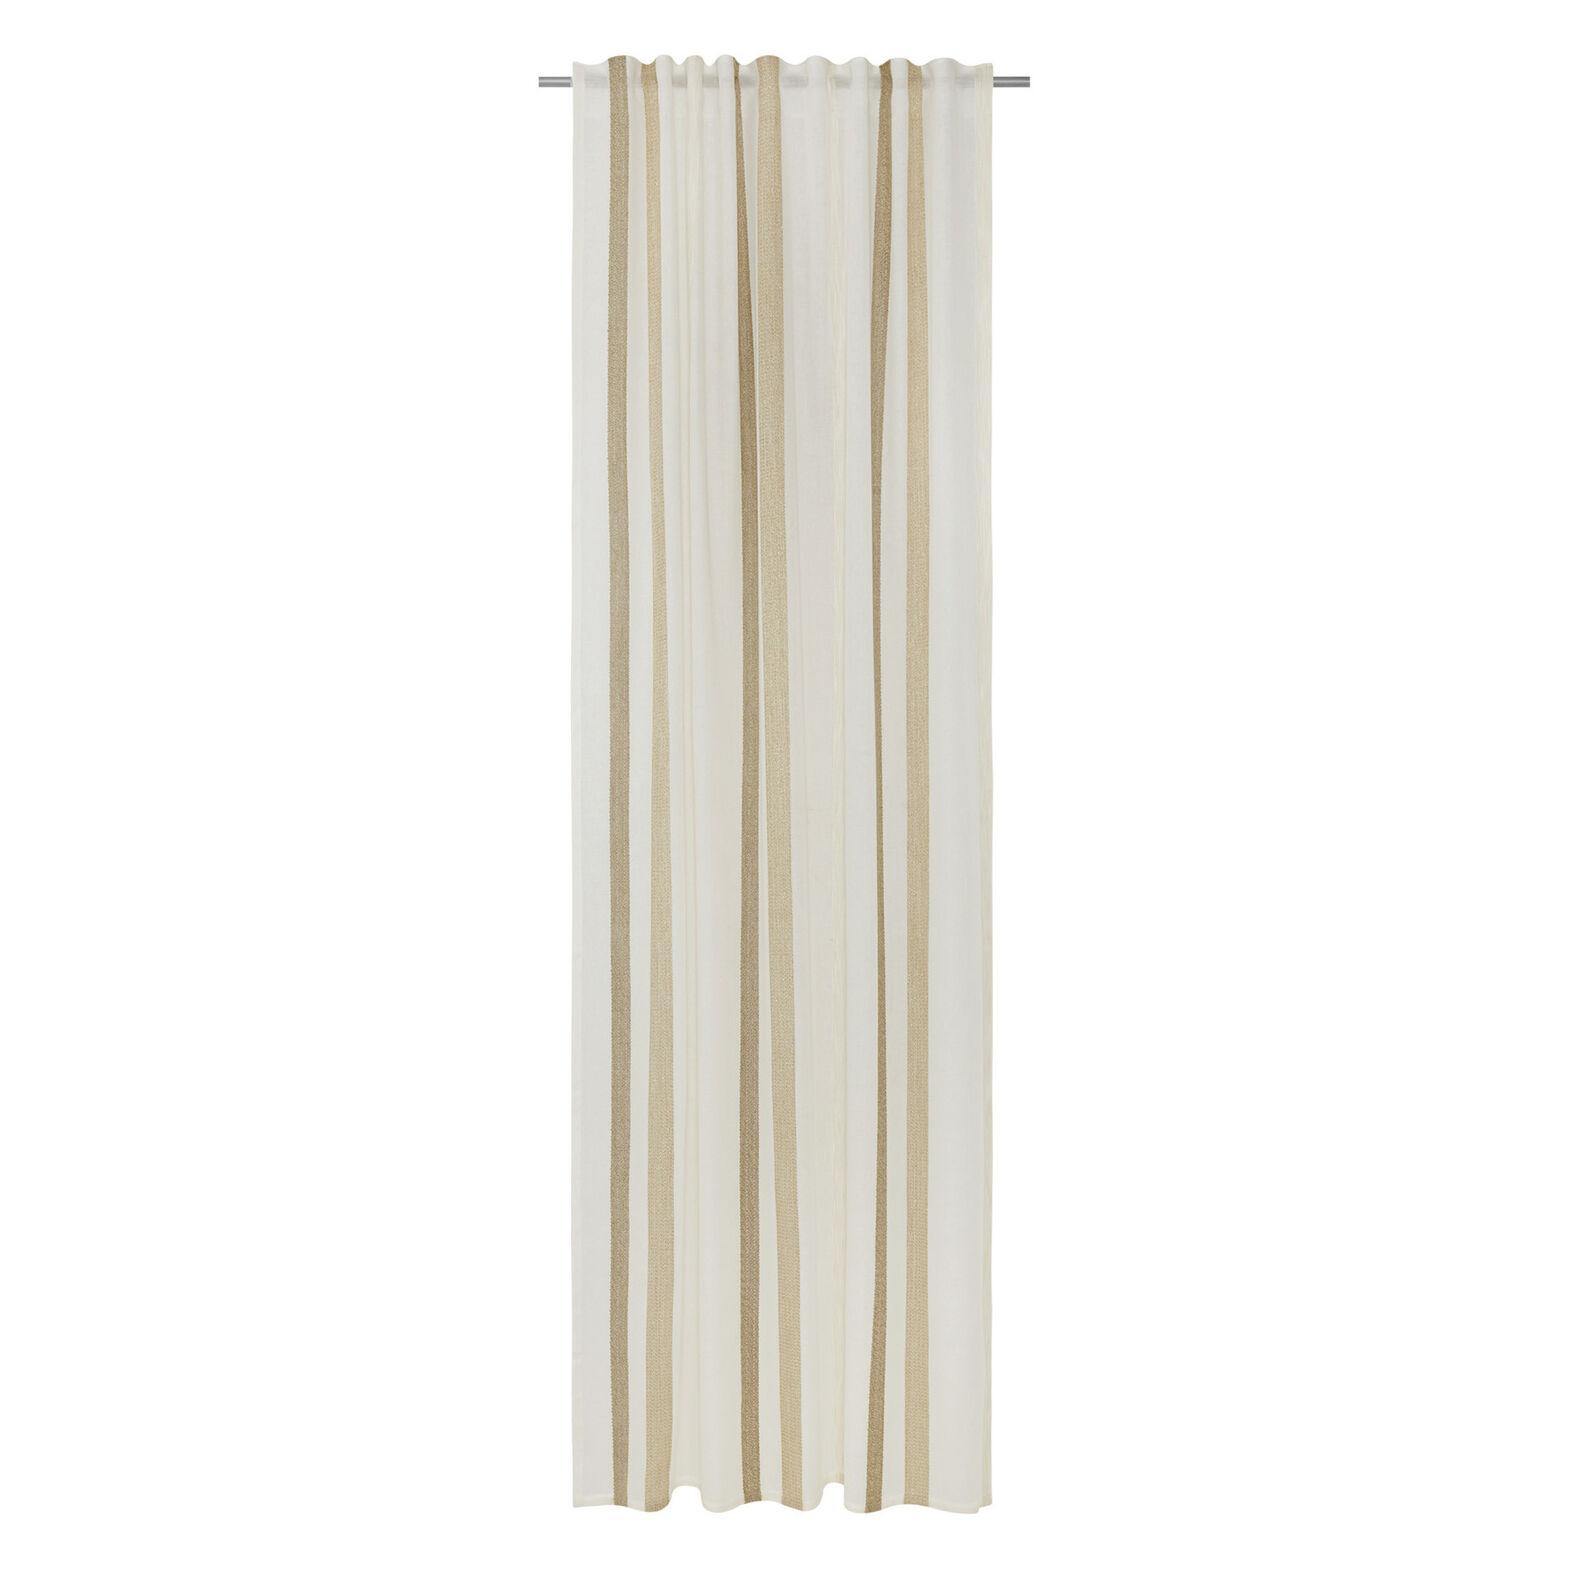 Curtain fabric with hidden pass-through stripes